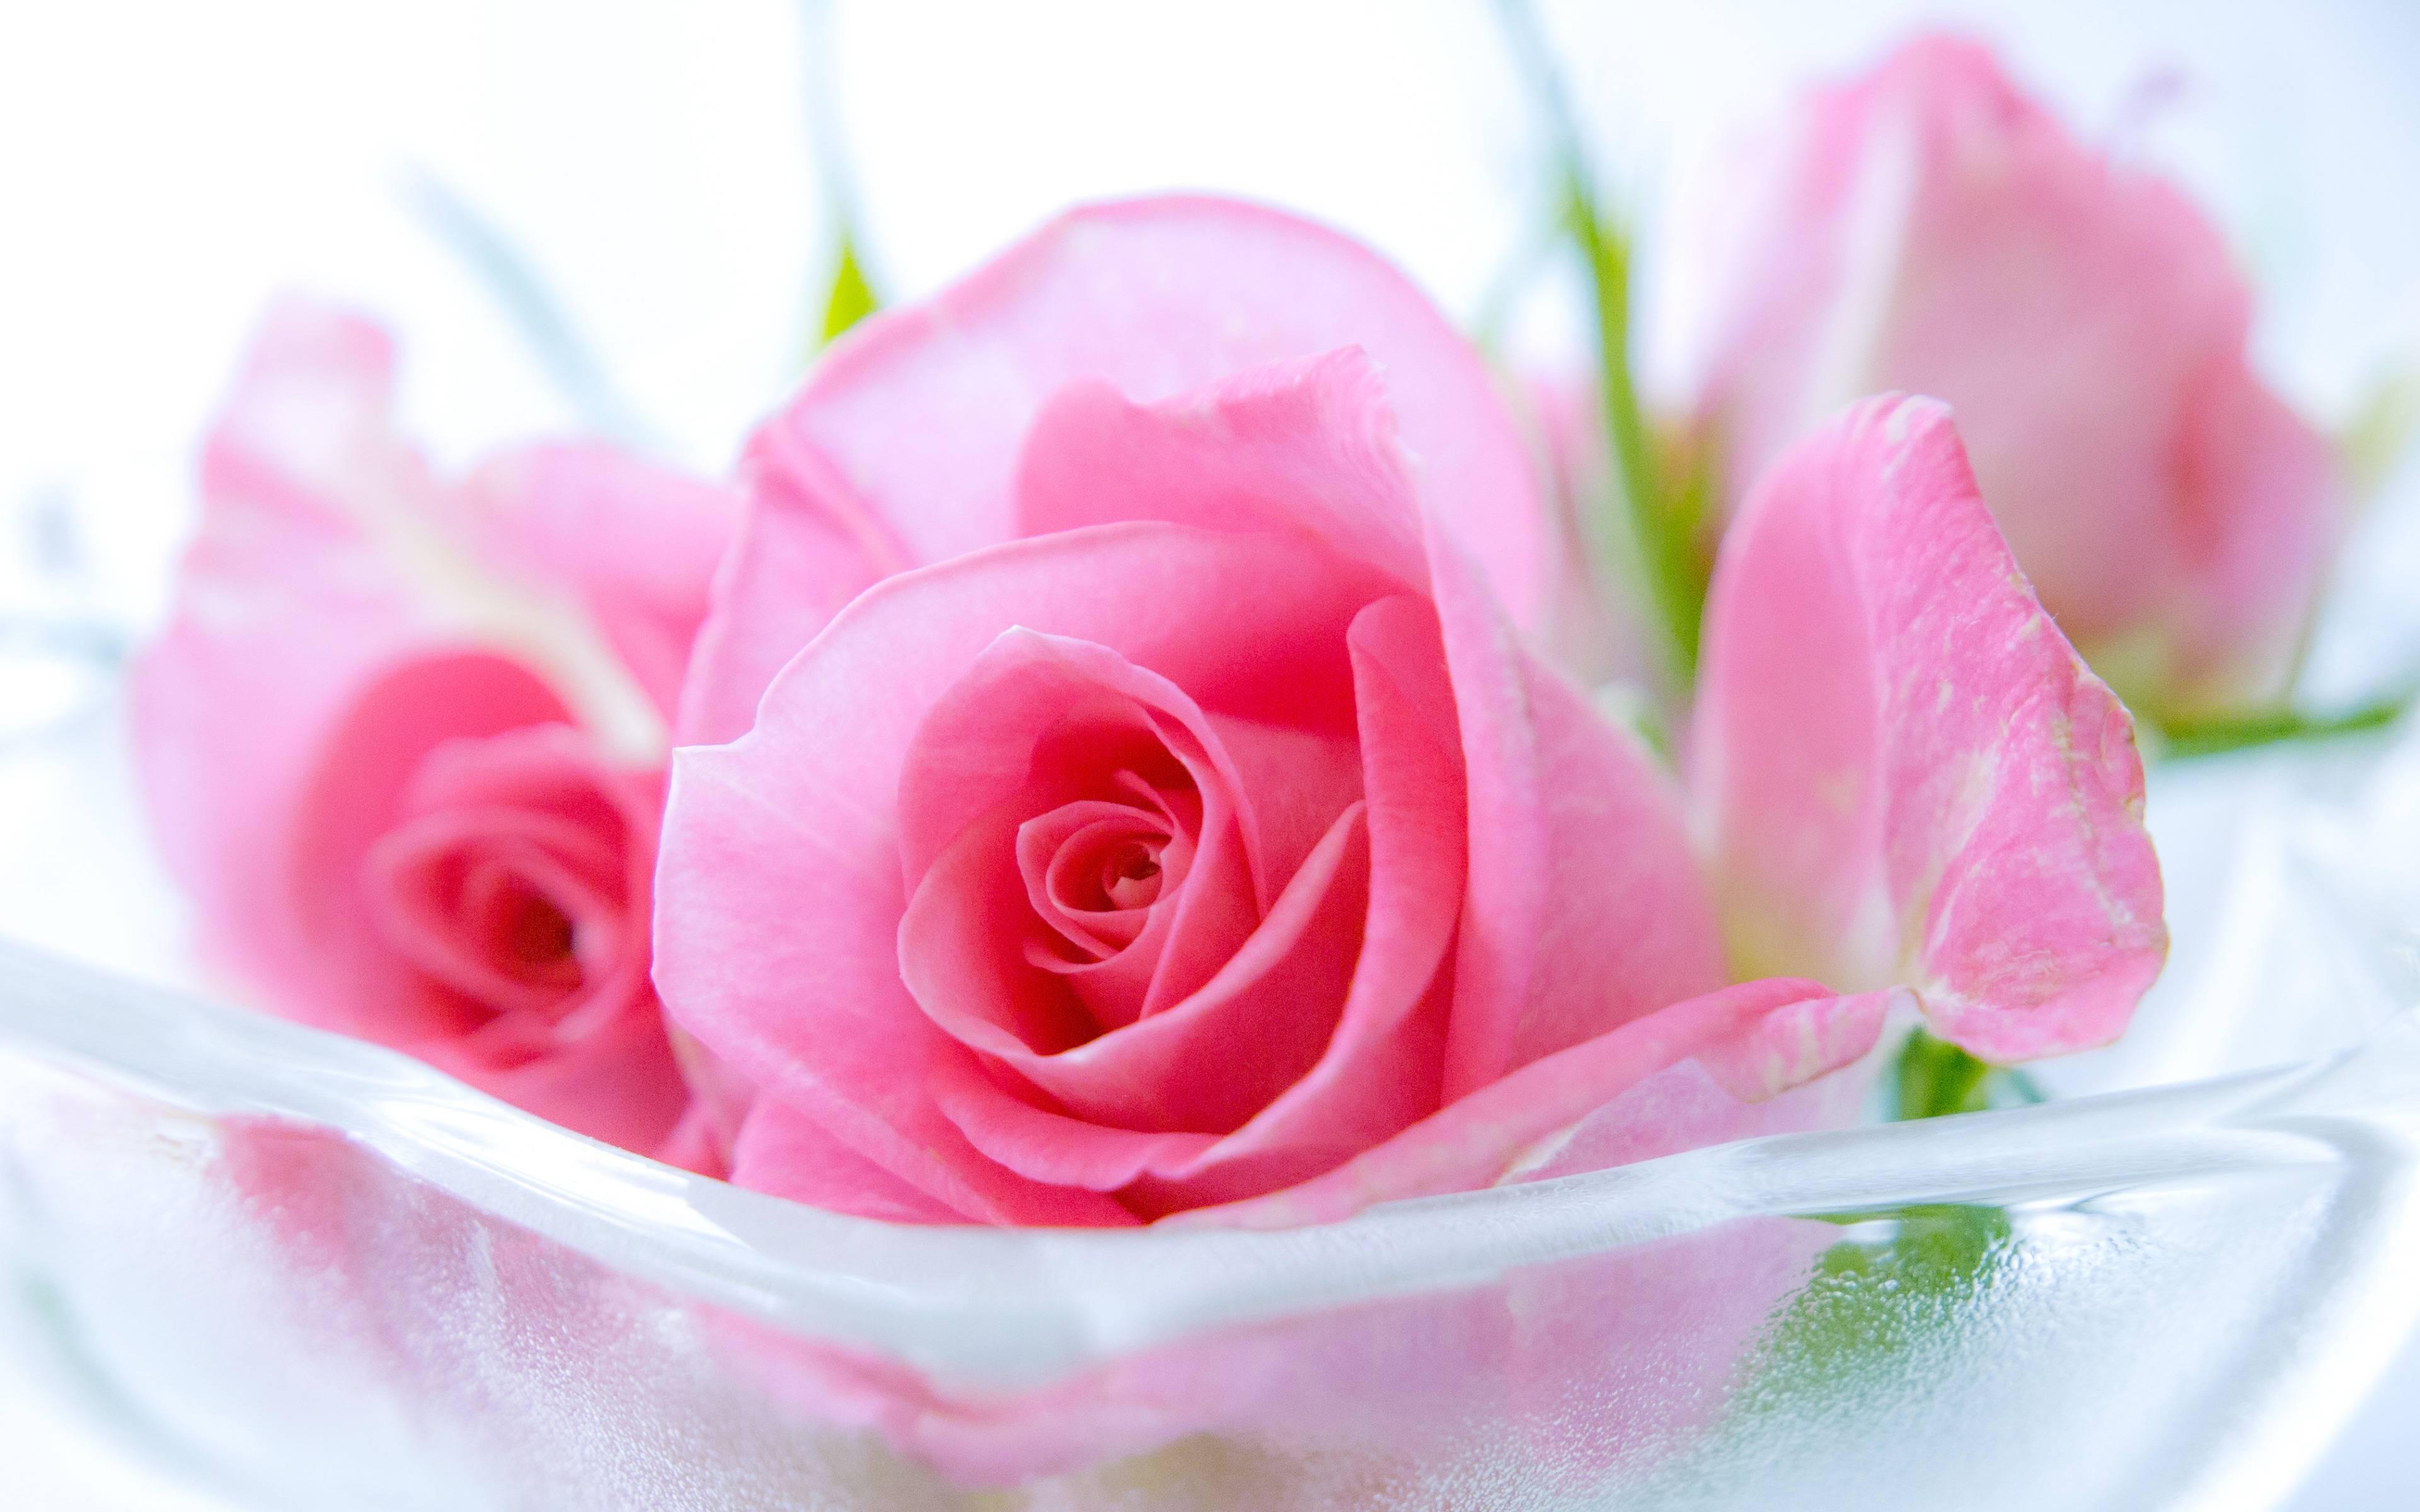 Pink Rose Wallpaper Design Hd Wallpapers